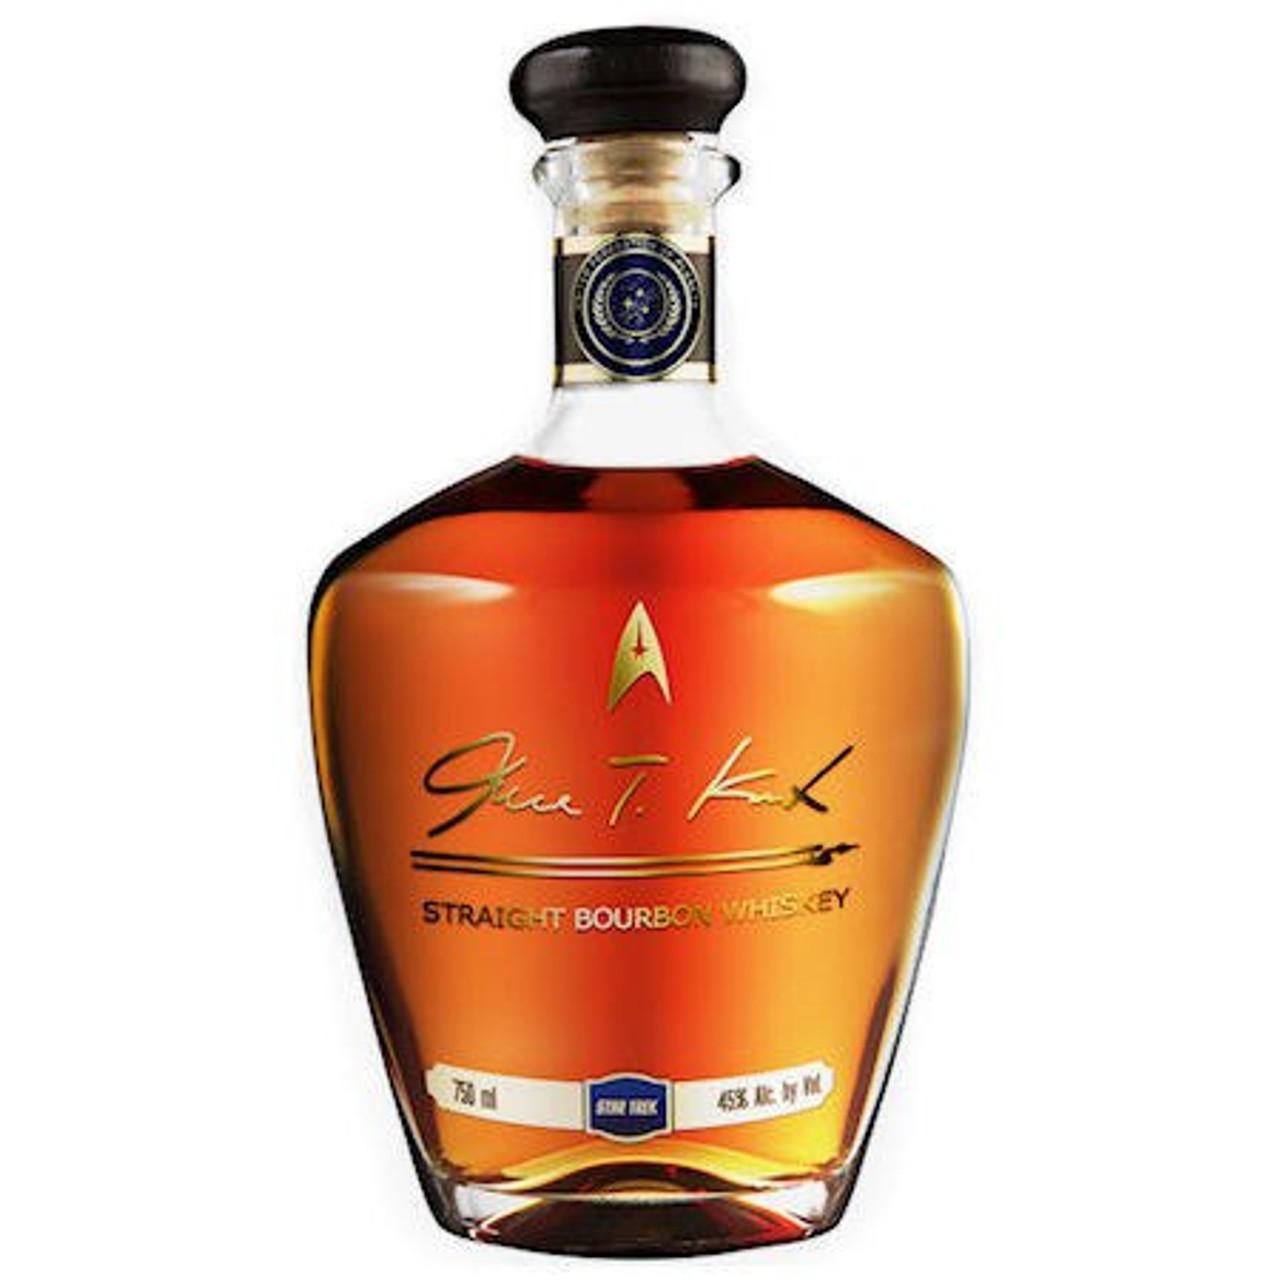 James T. Kirk Straight Bourbon Whiskey 750ml